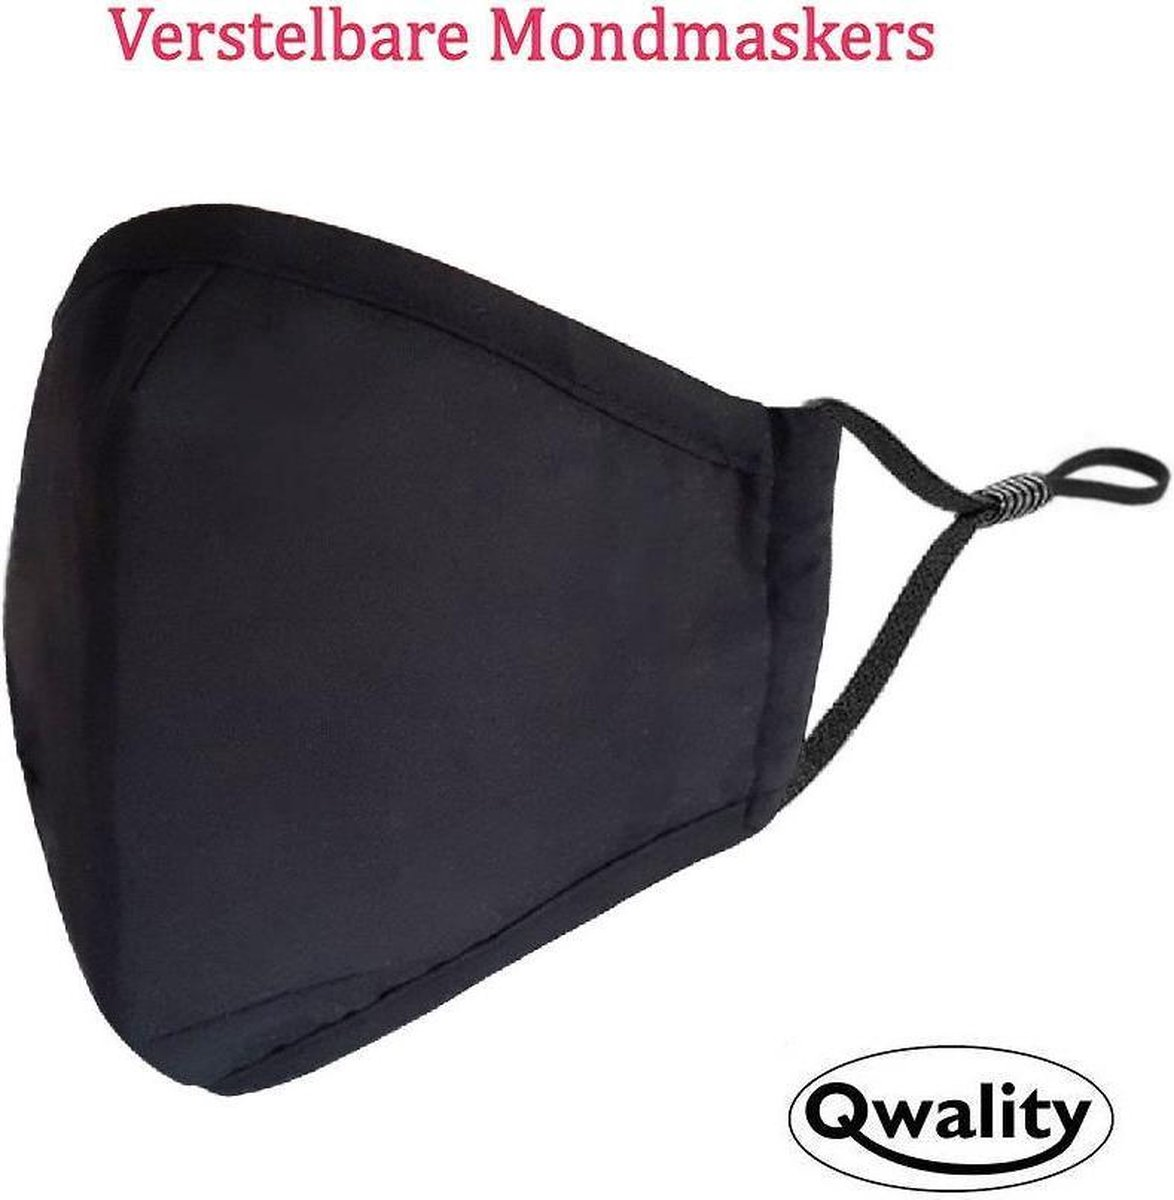 Mondkapje - Stof - Wasbaar - Verstelbaar Mondmasker - Katoen - Met Neusbrug - Zwart - Inclusief Anti